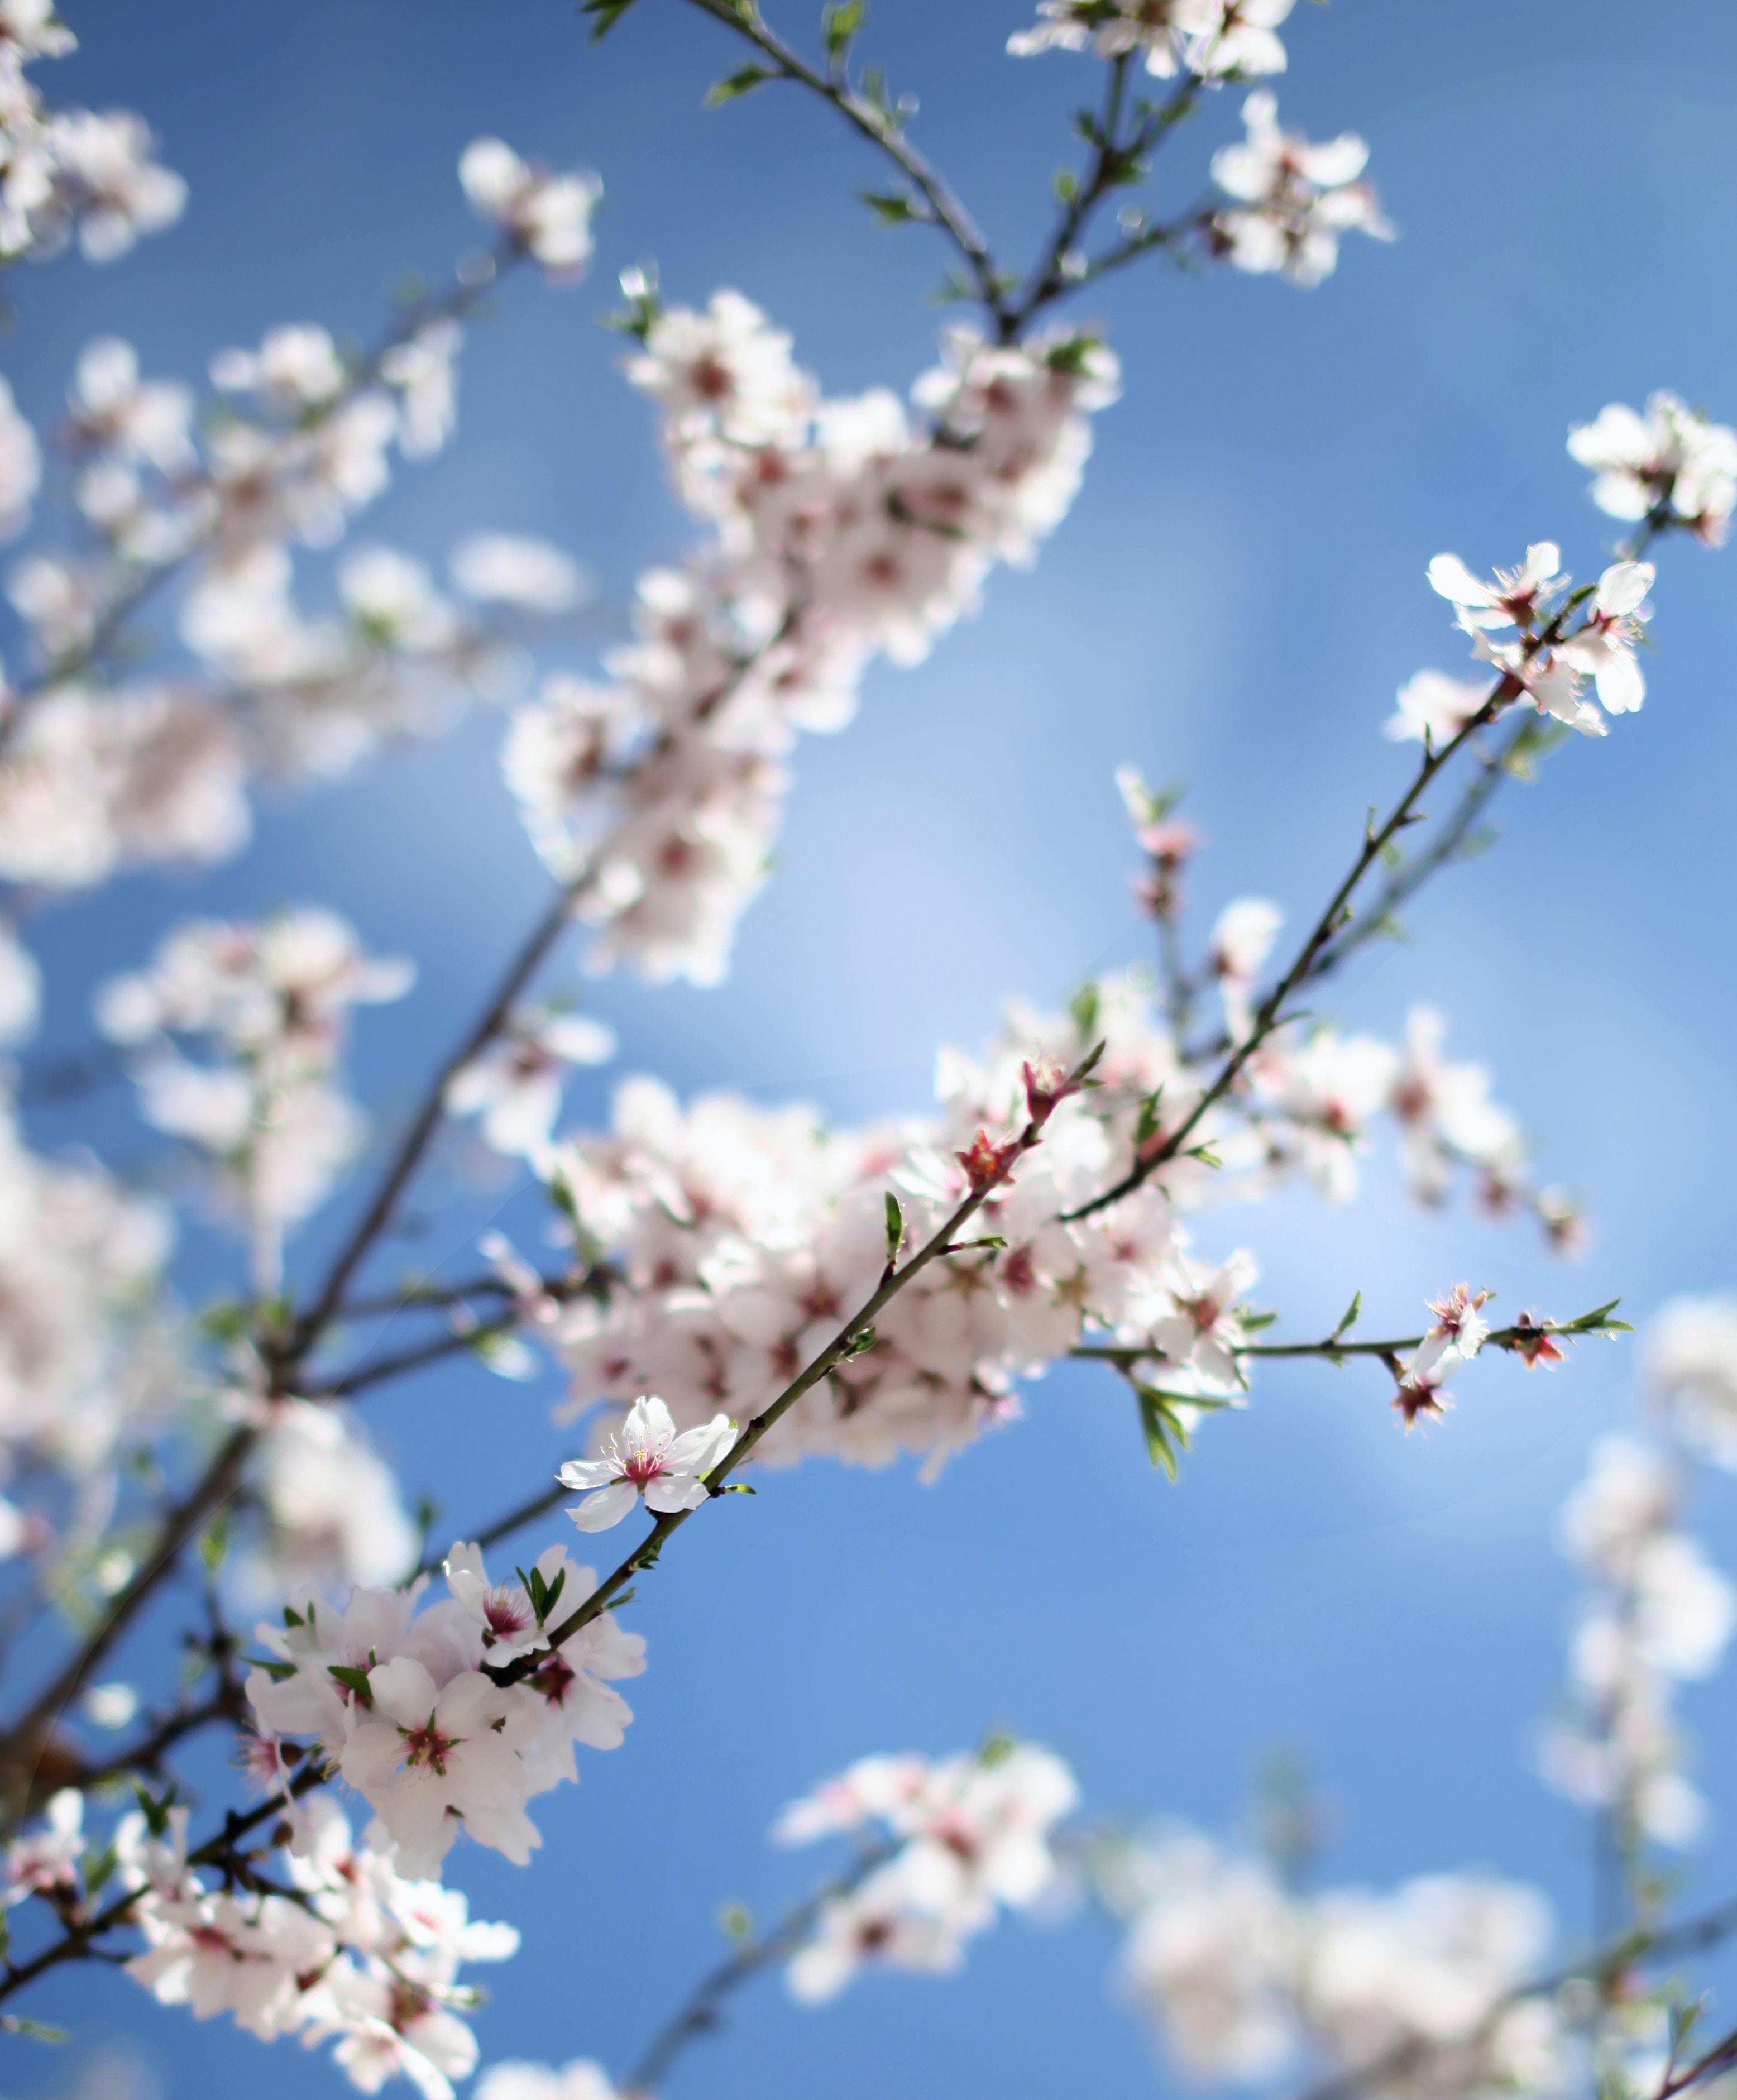 white petaled flowers